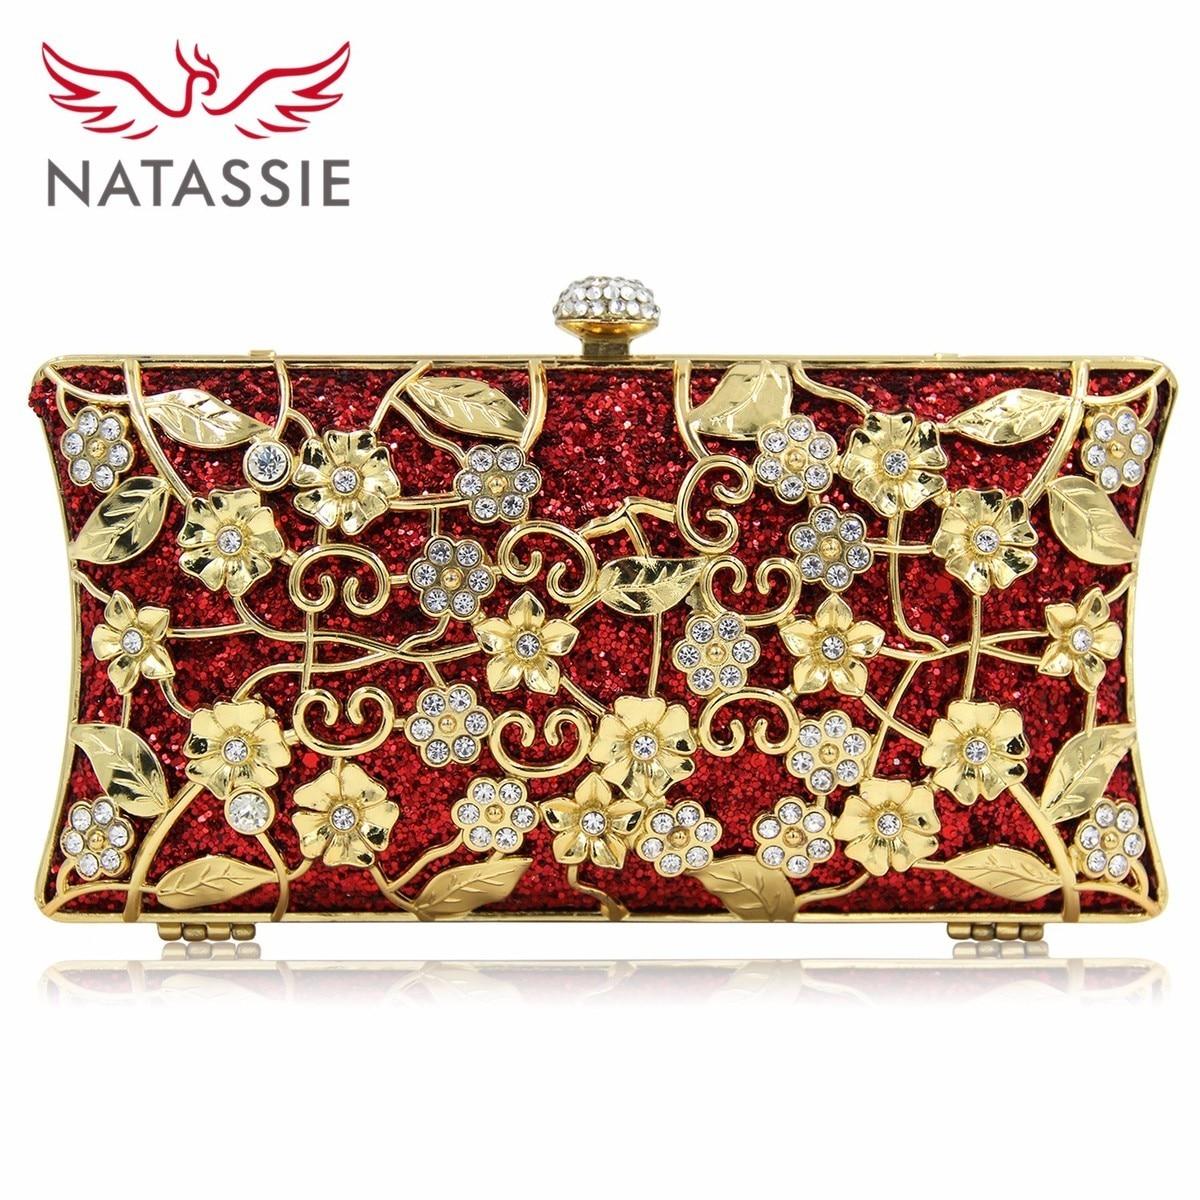 Natassie 2017 New Fashion Women Metal Gold Flower Pattern Party Bags Hard Case Evening Clutch Purses With Diamond Closure fawziya evening bags kisslock purses hard case clutch evening party bags